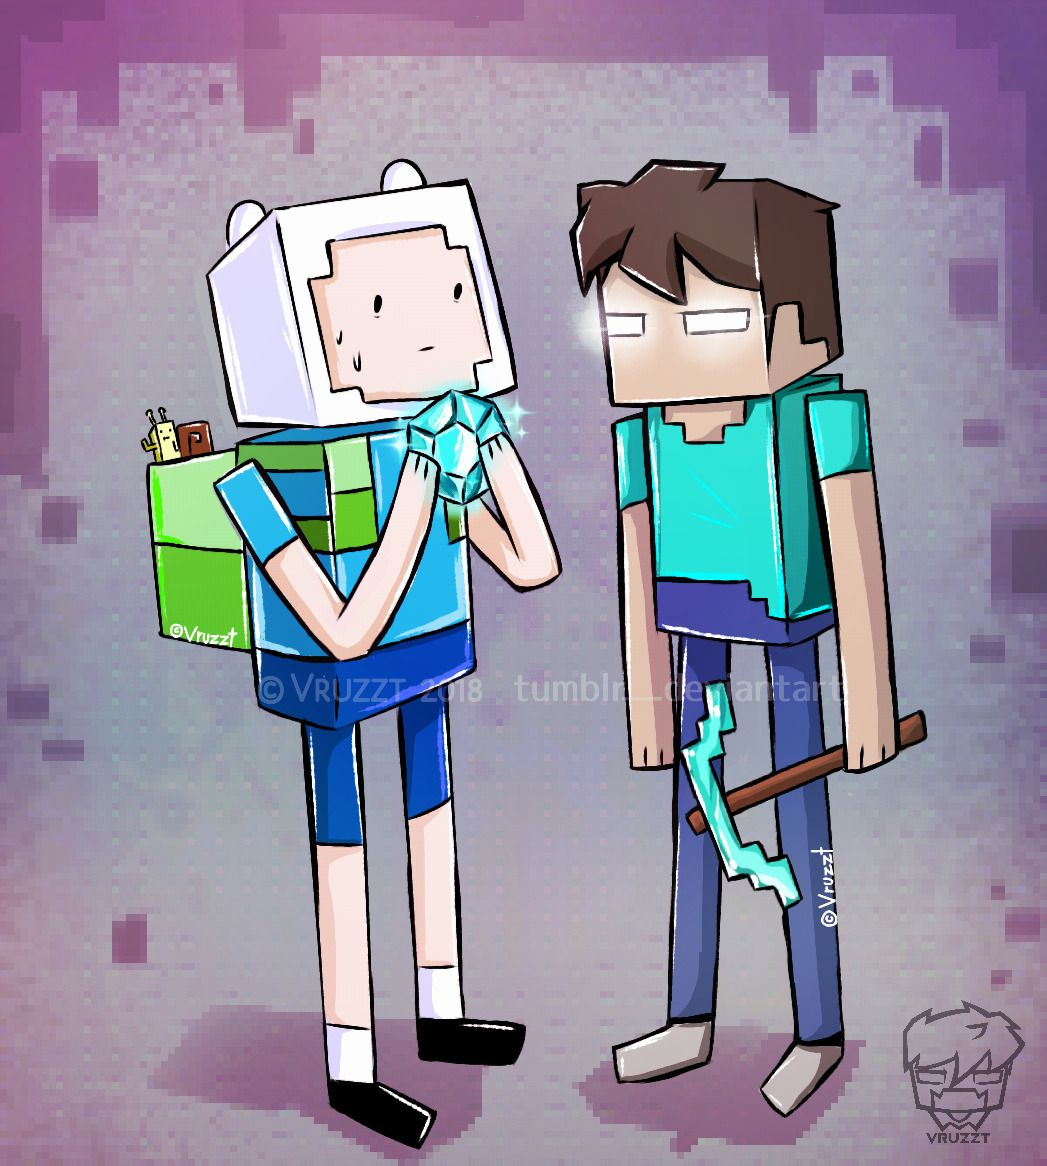 Tumblr Pcdj7xp9v31w44zi6o1 1280 Pnj 1047 1166 Minecraft Anime Minecraft Drawings Minecraft Art